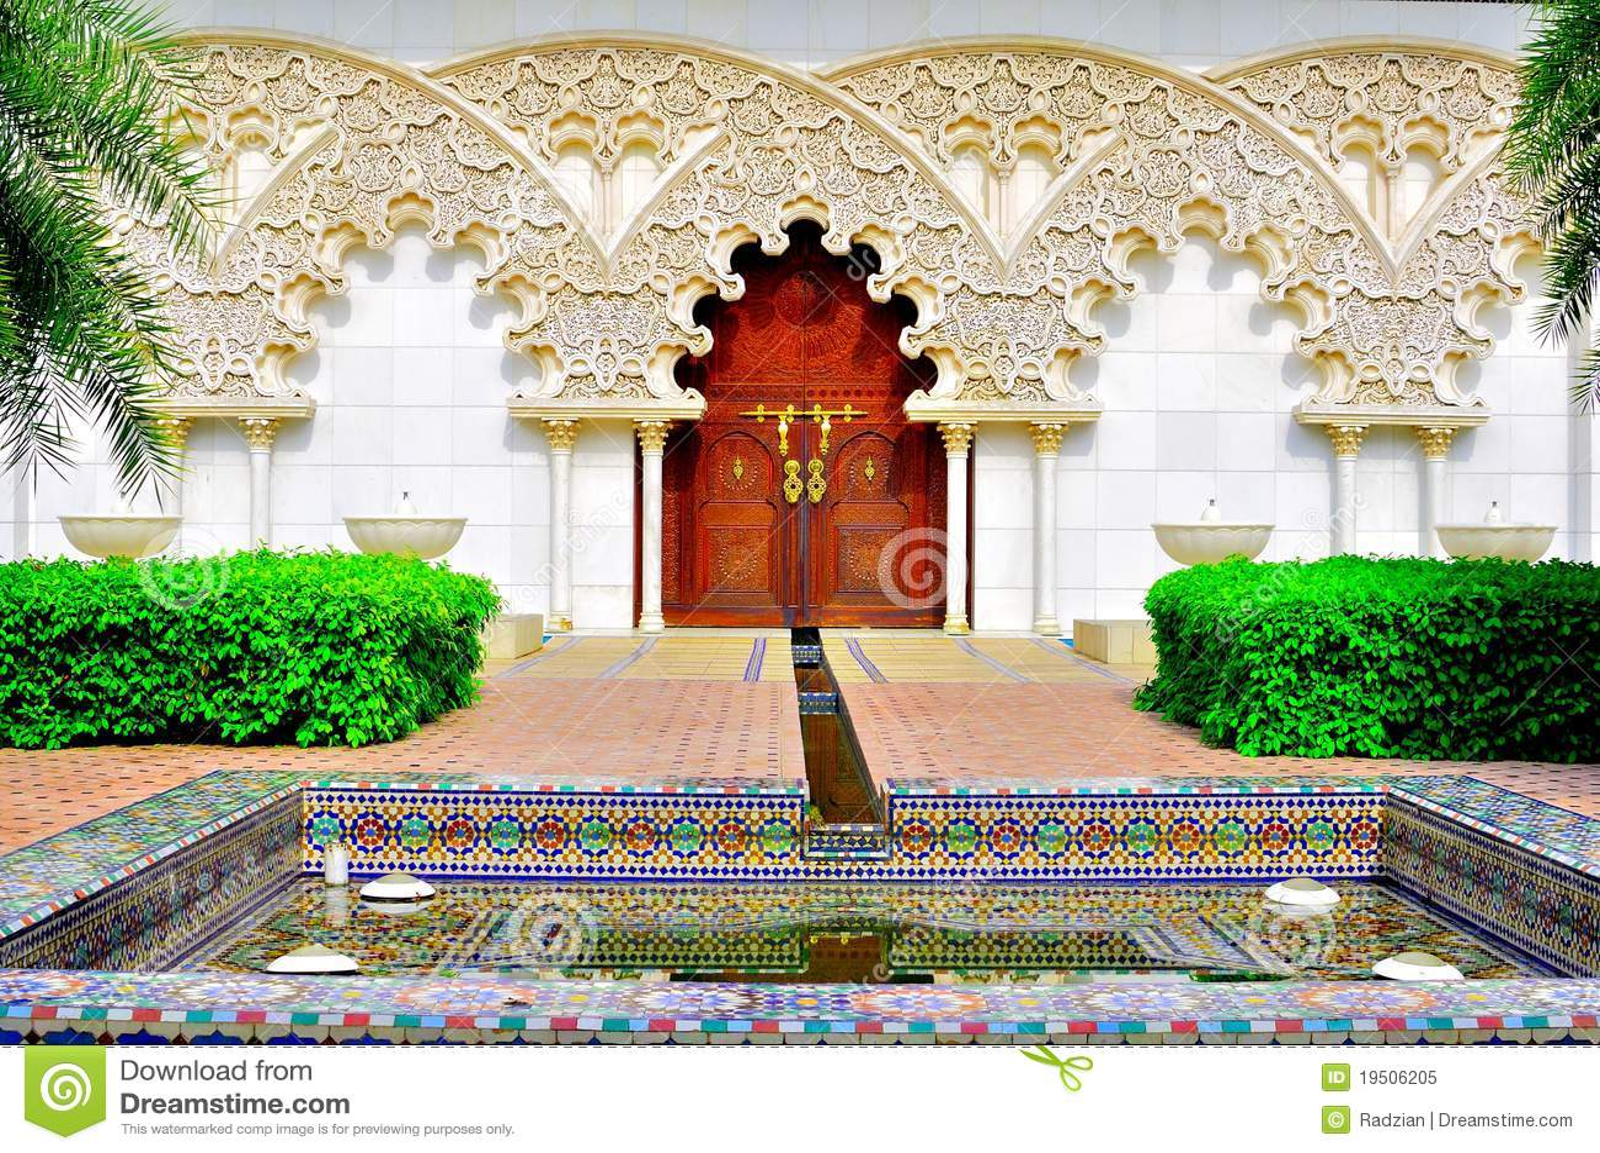 Marokkaanse tuin en architectuur royalty vrije stock foto afbeelding 19506205 - Tuin decoratie buitenkant ...